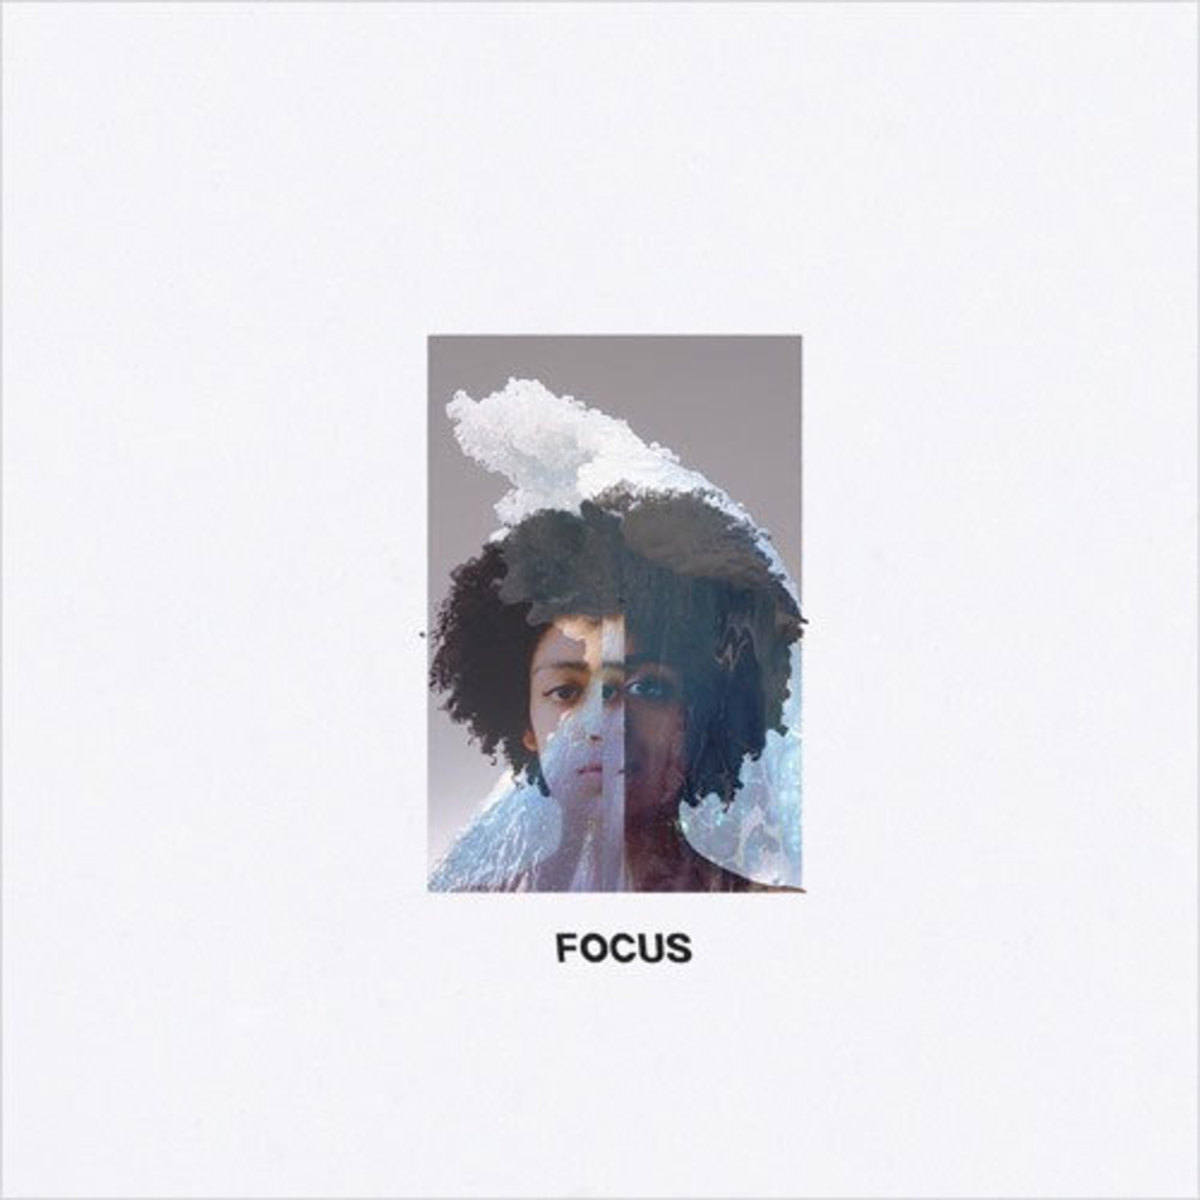 kwey-focus.jpg